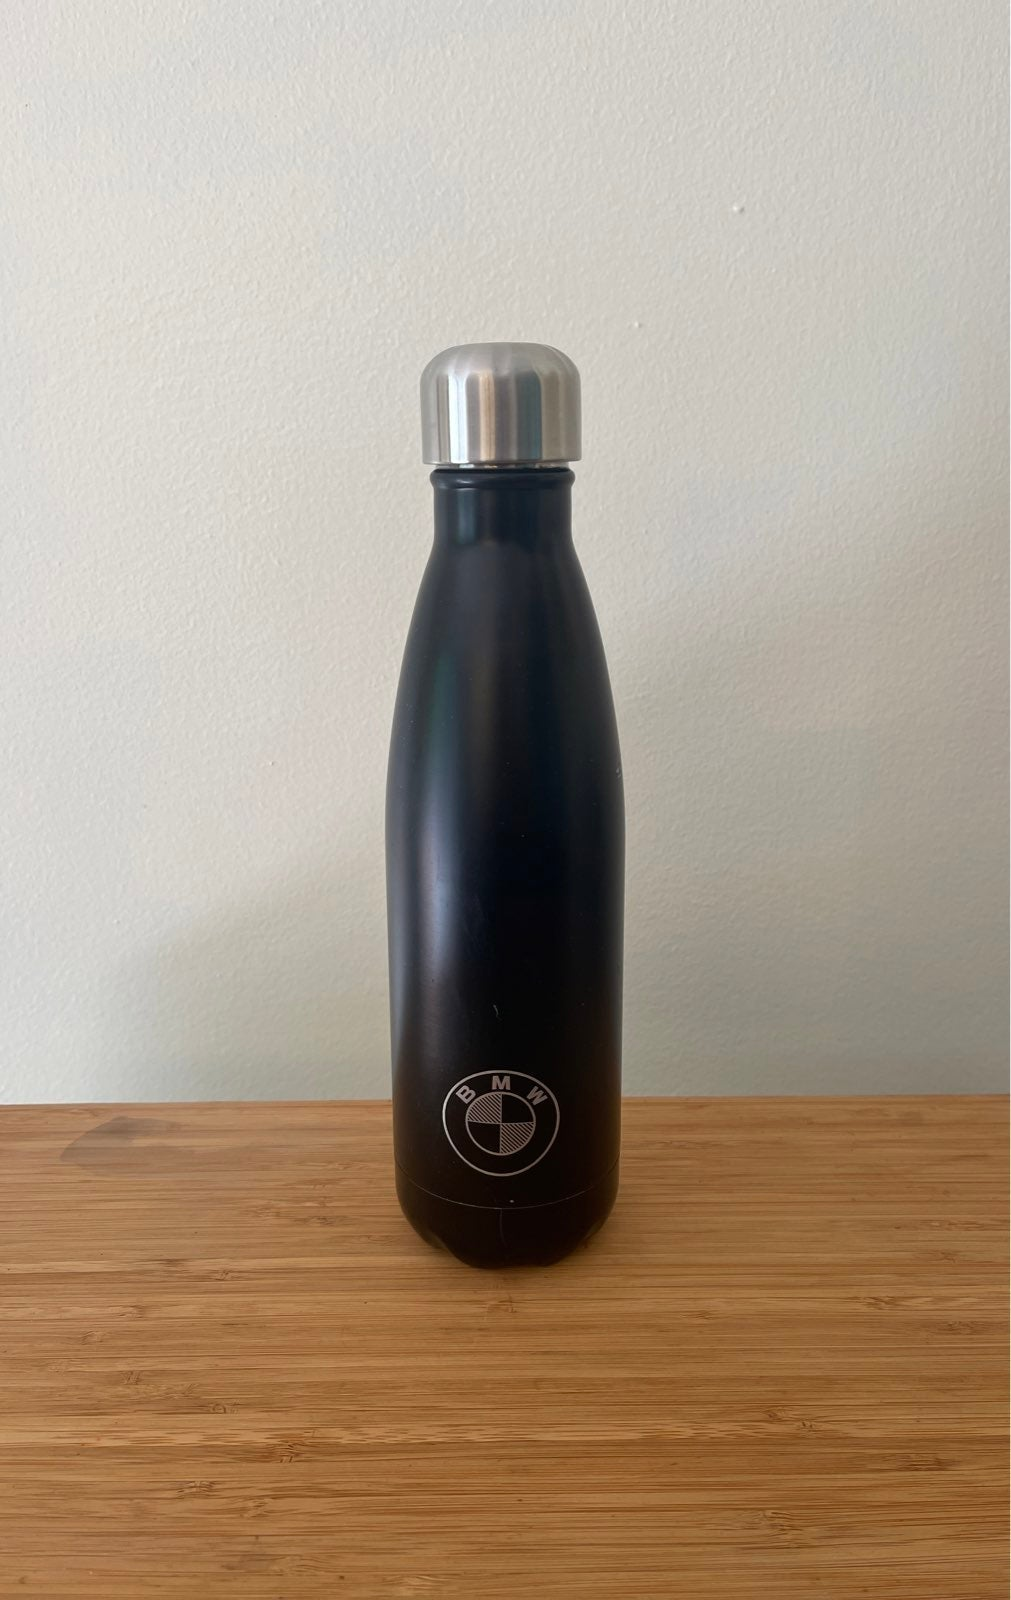 BMW S'well water bottle